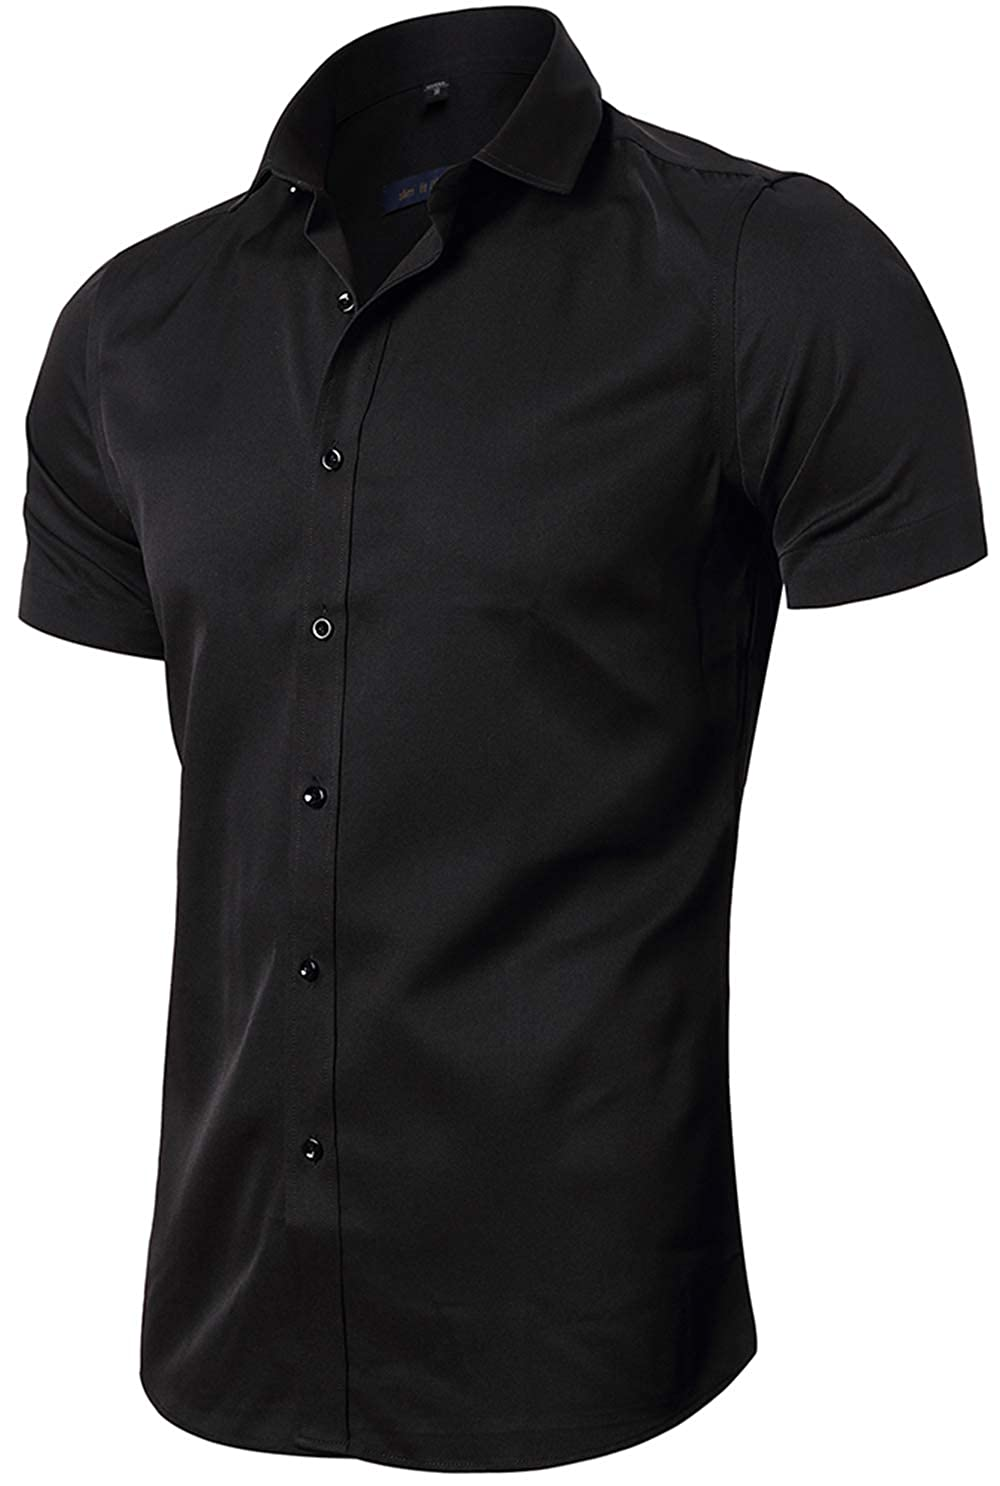 72fe1ffda67 FLY HAWK Mens Short Sleeve Dress Shirts, Slim Fit Casual Button Down Tuxedo  Work Shirt